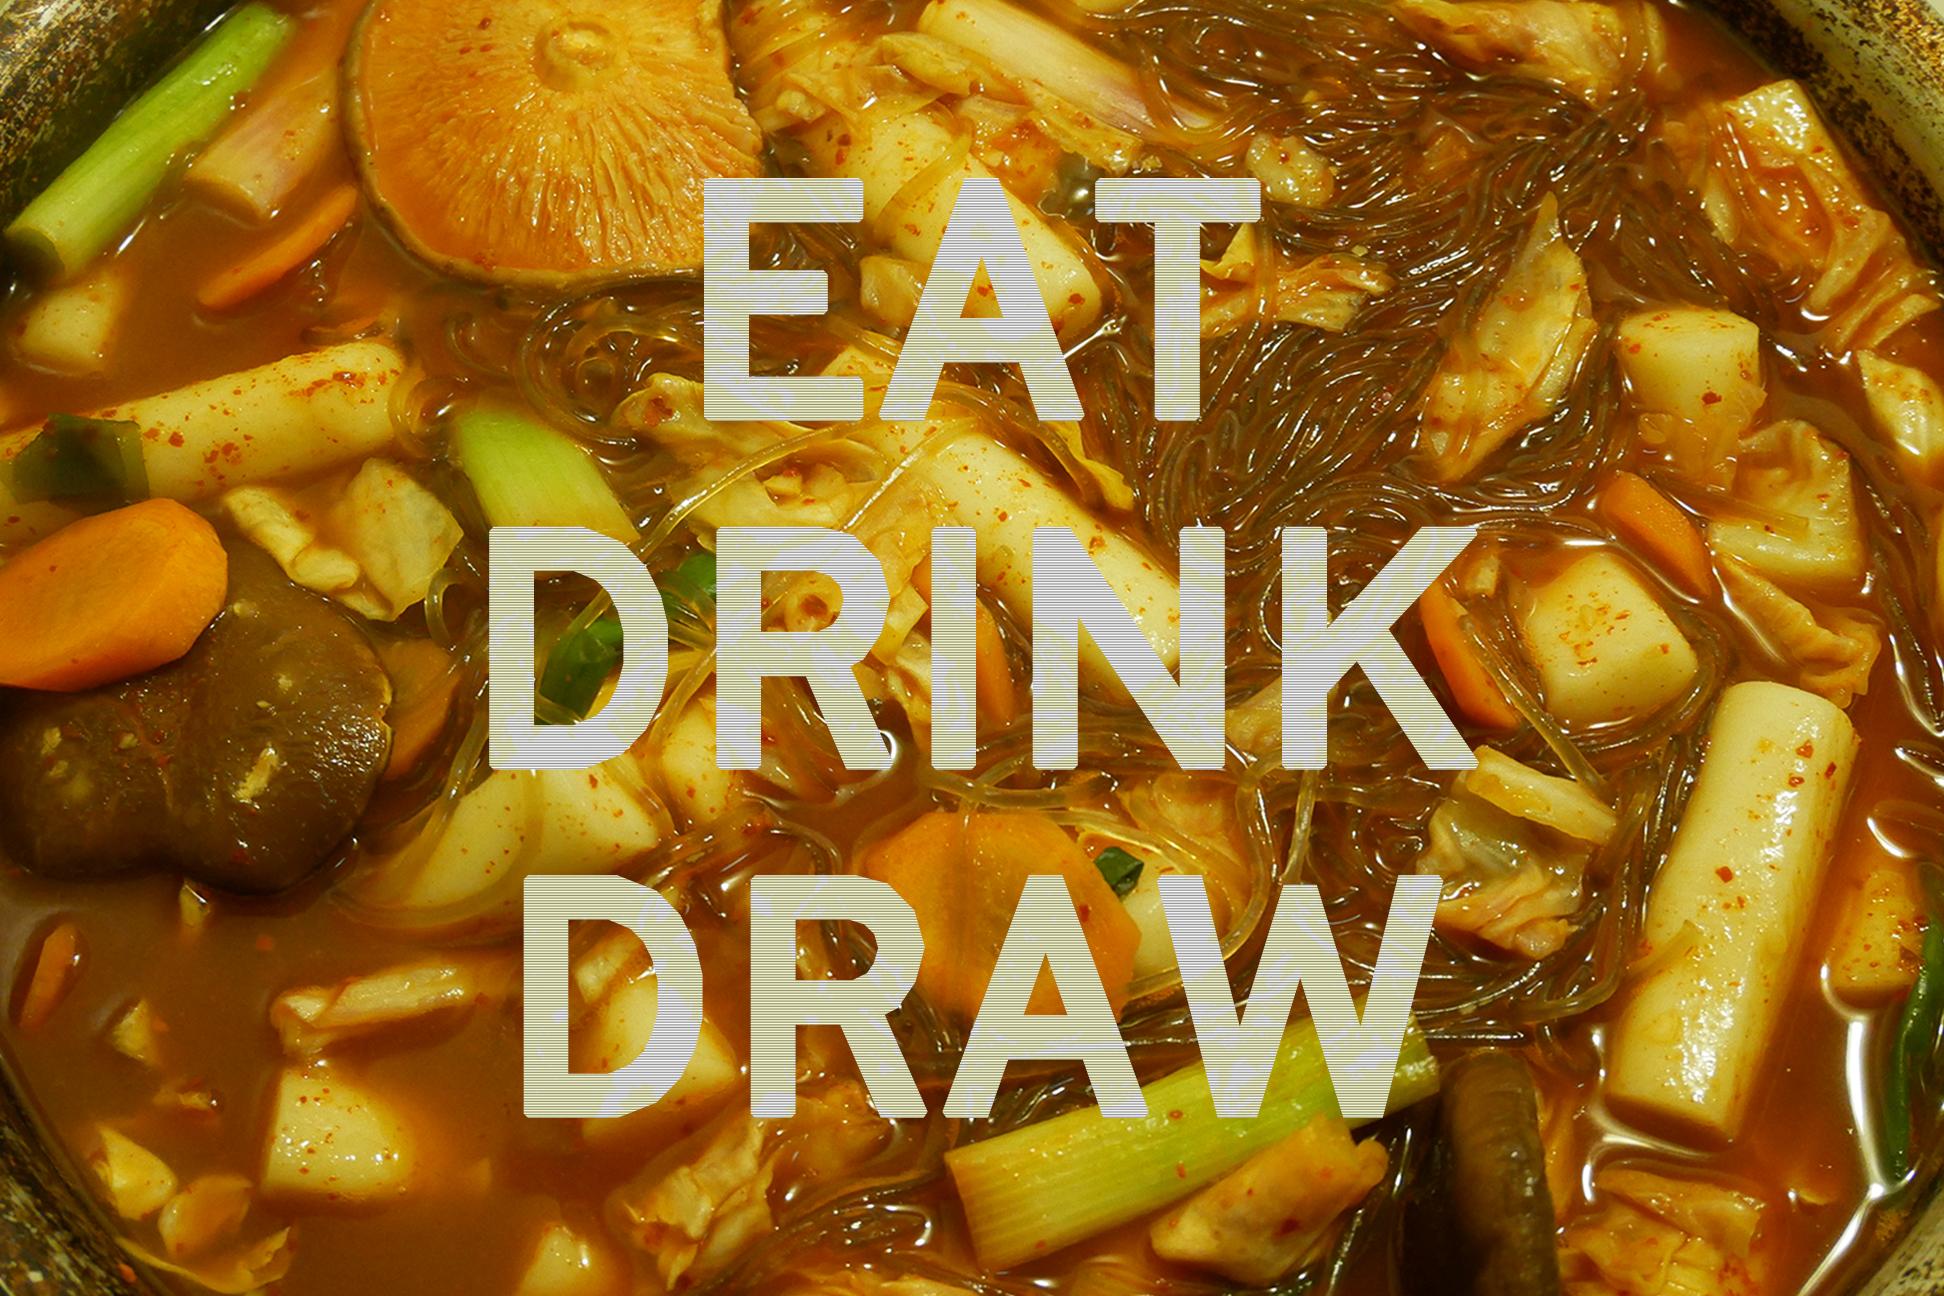 eatdrinkdraw rect.jpg